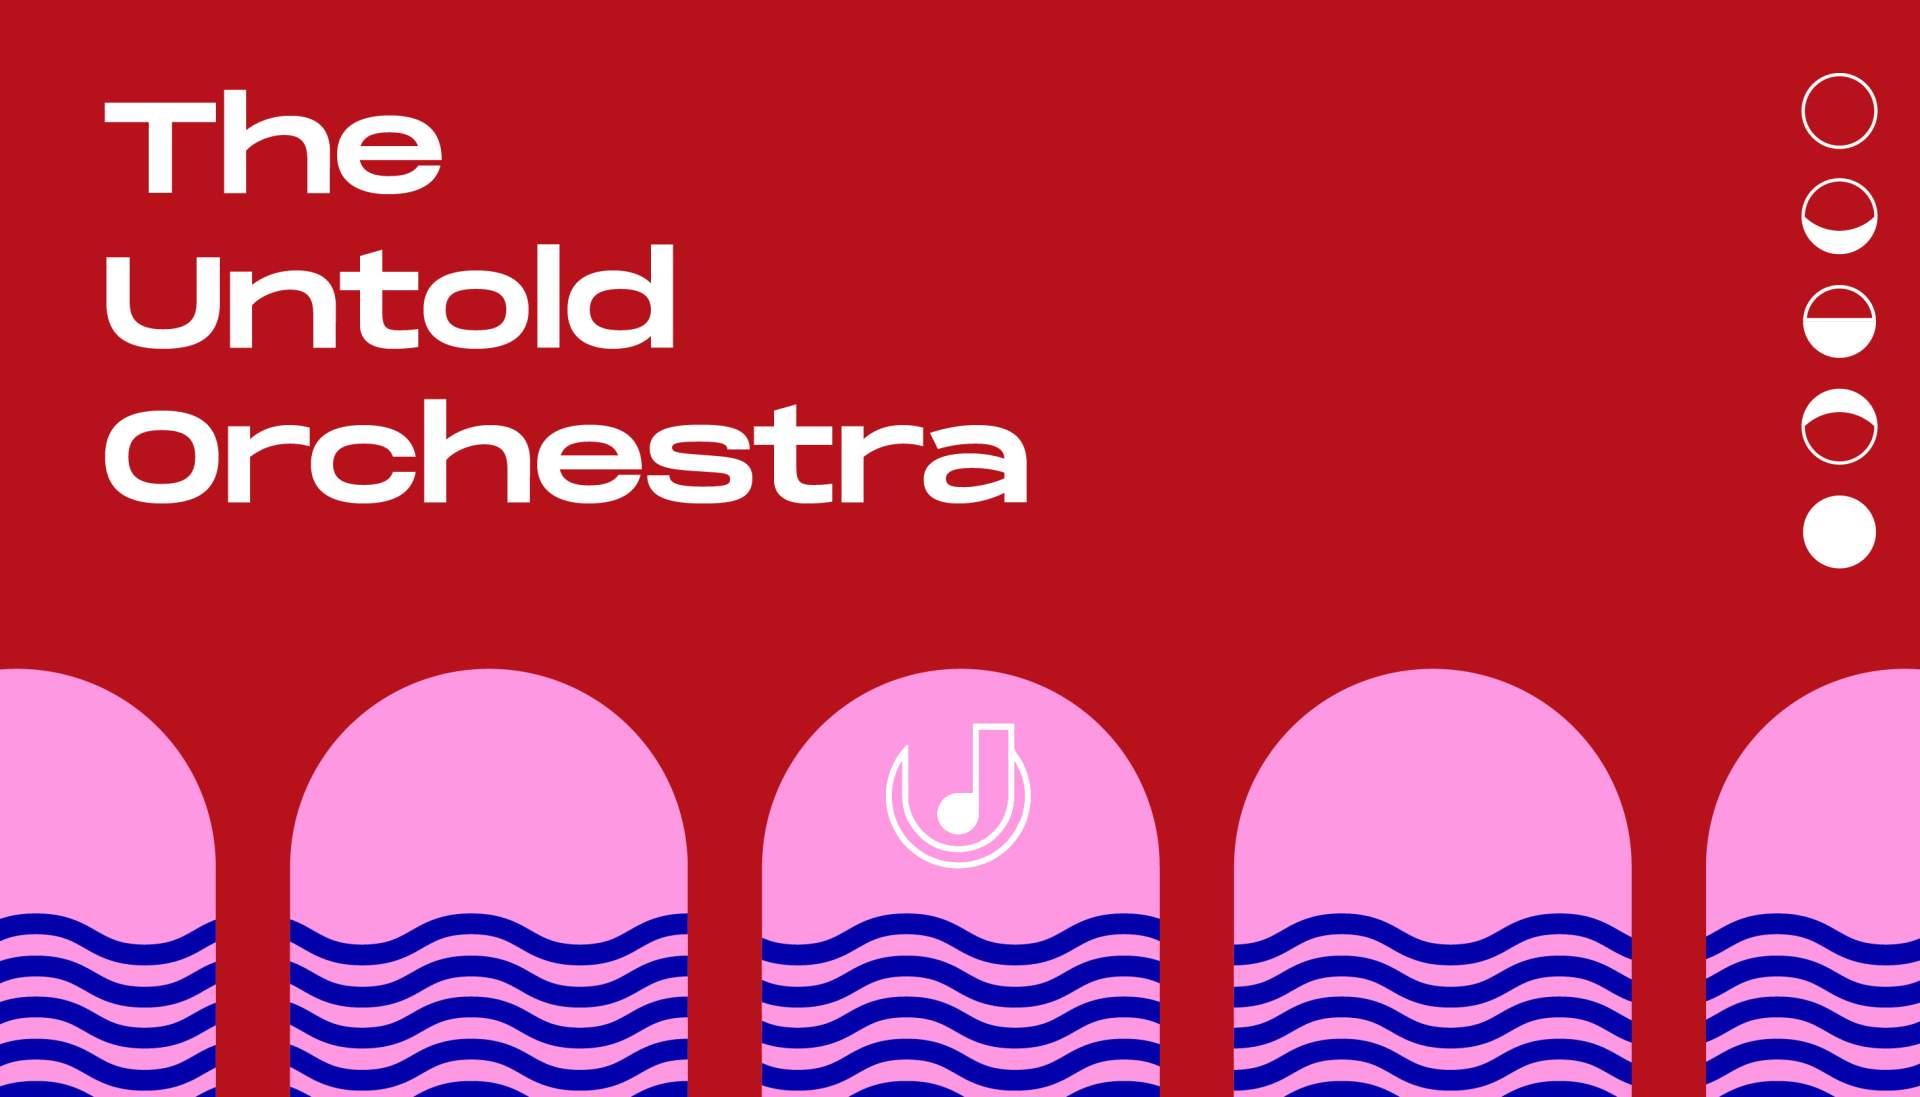 The Untold Orchestra